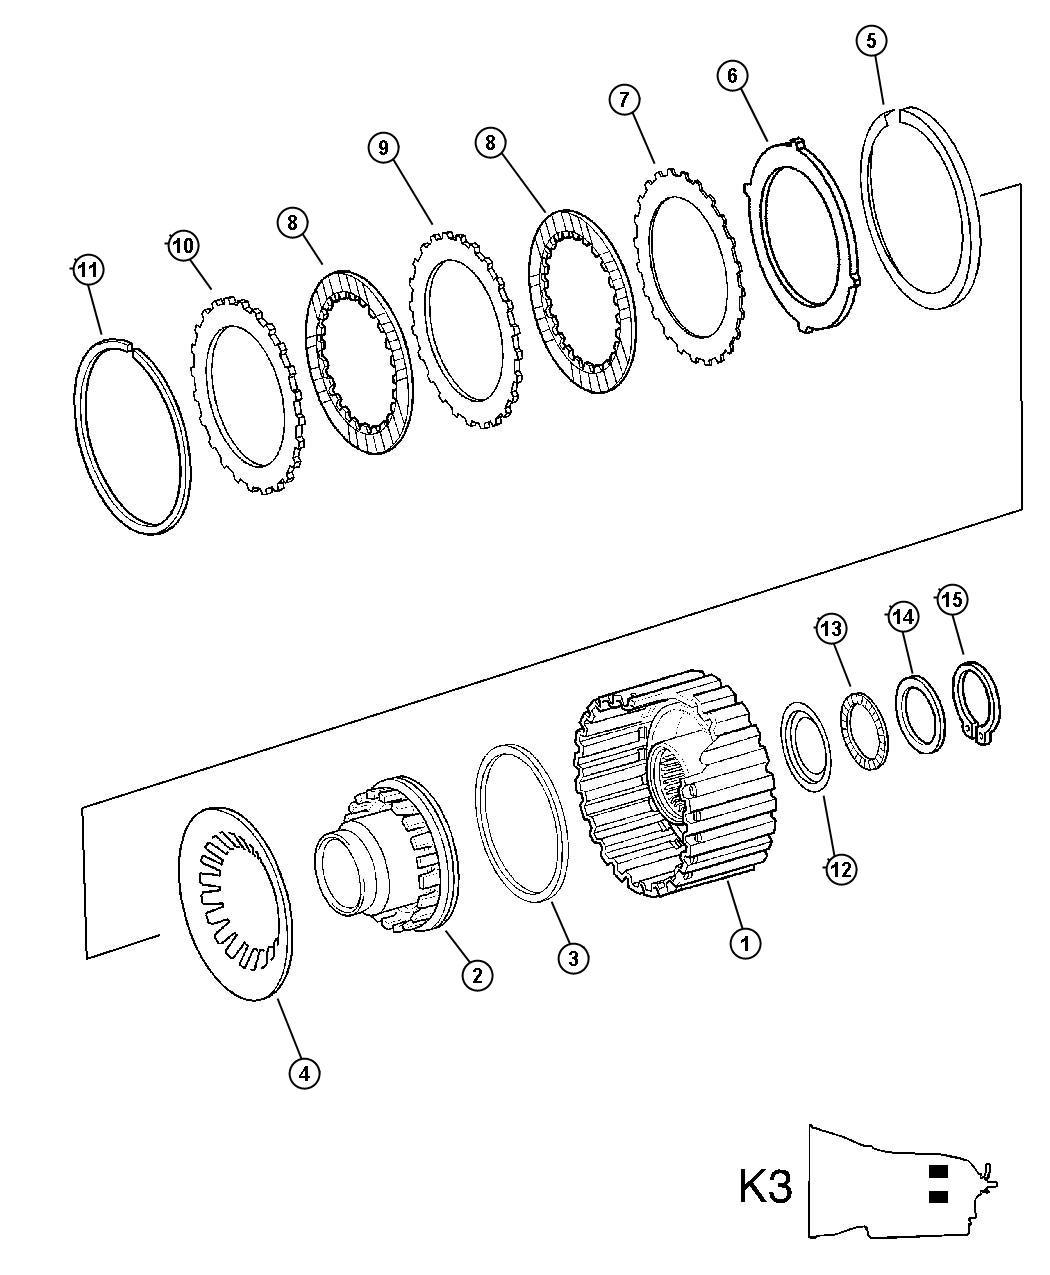 Chrysler Crossfire Snap ring. [2.3 mm], [[2.gov't parts